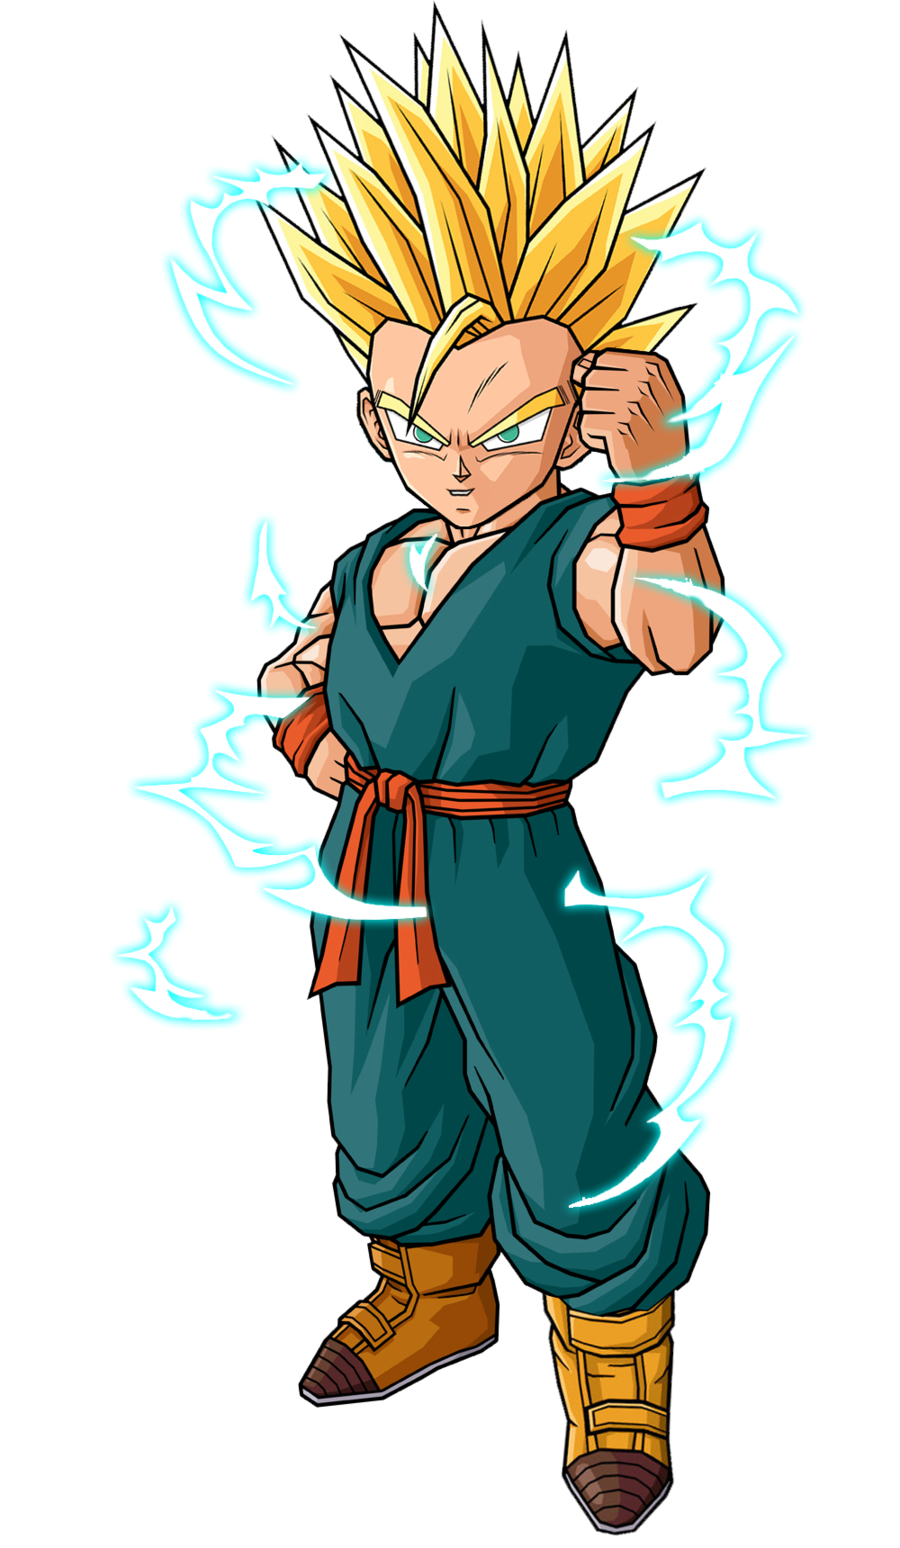 Kid Goten Super Saiyan 3